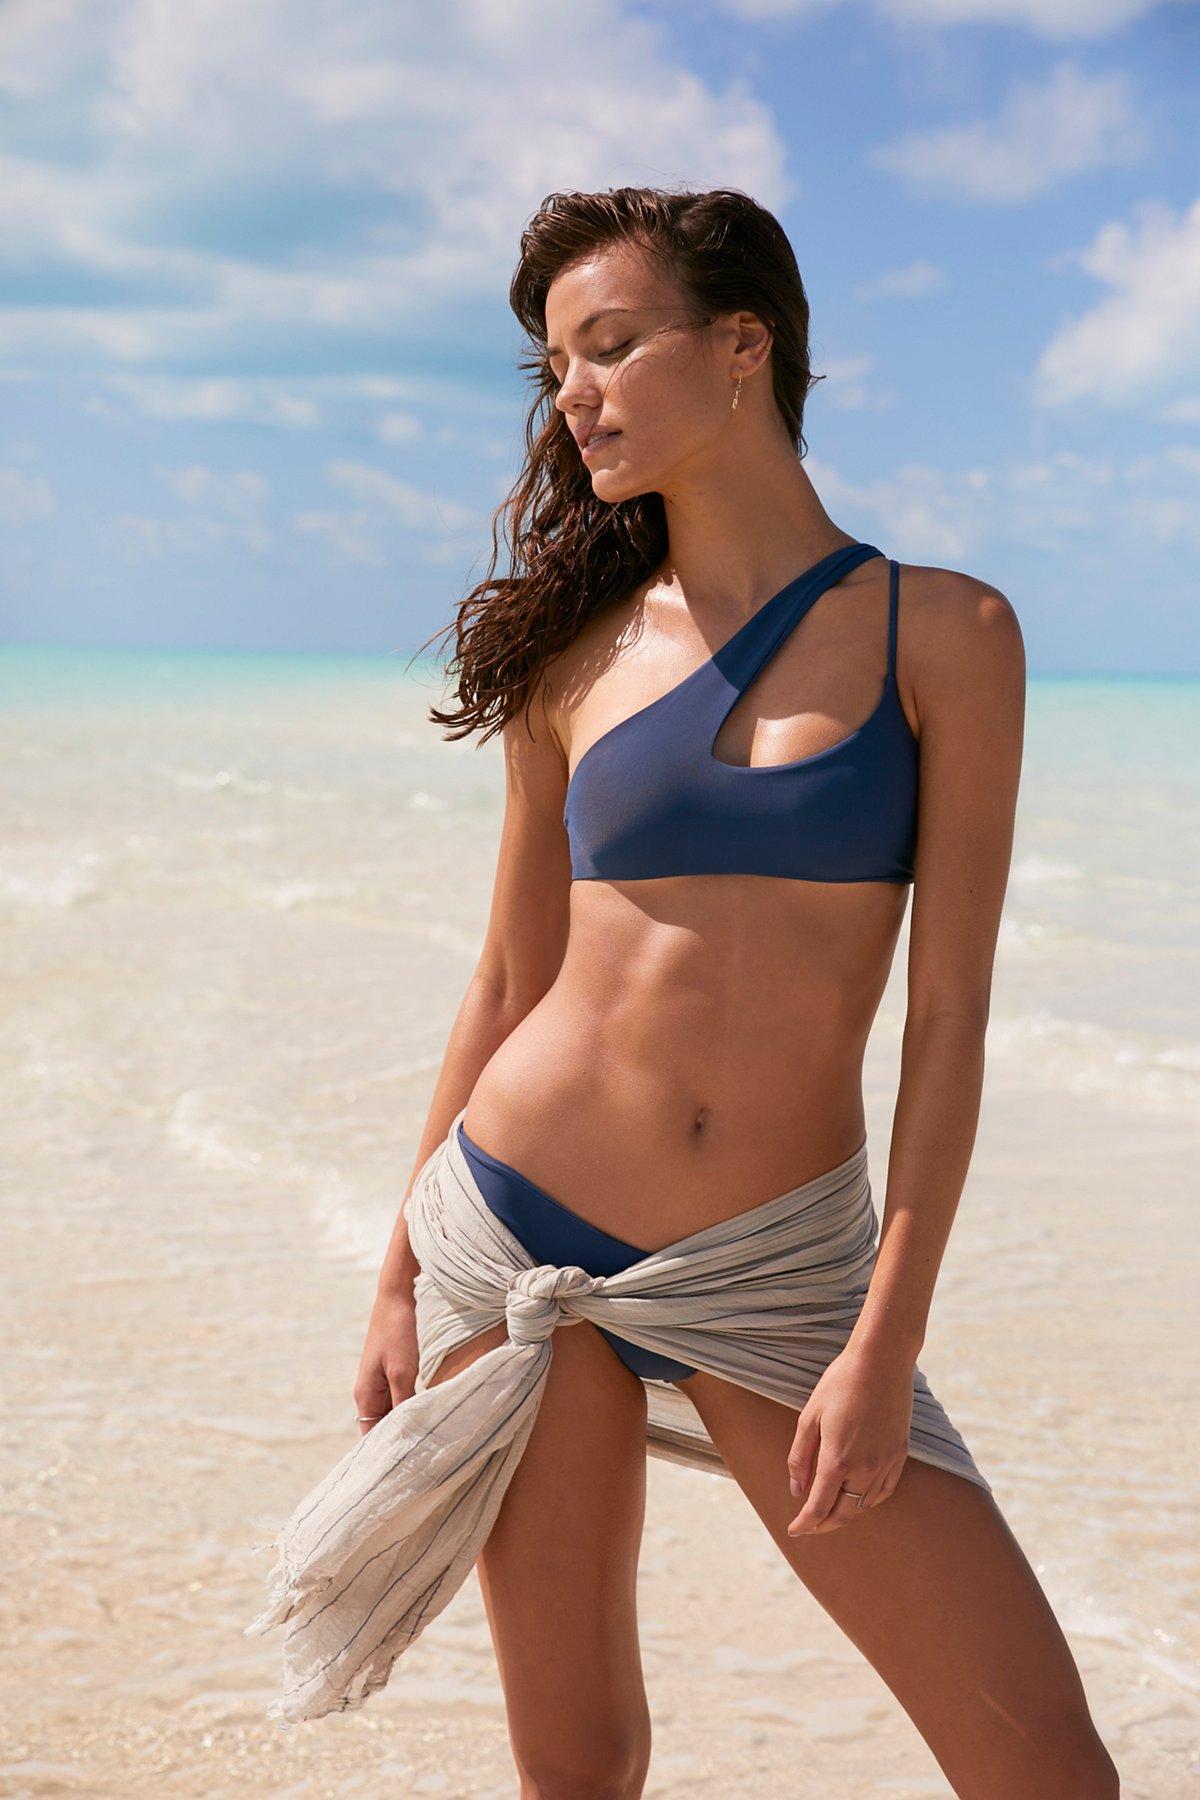 Queensland Bikini Top